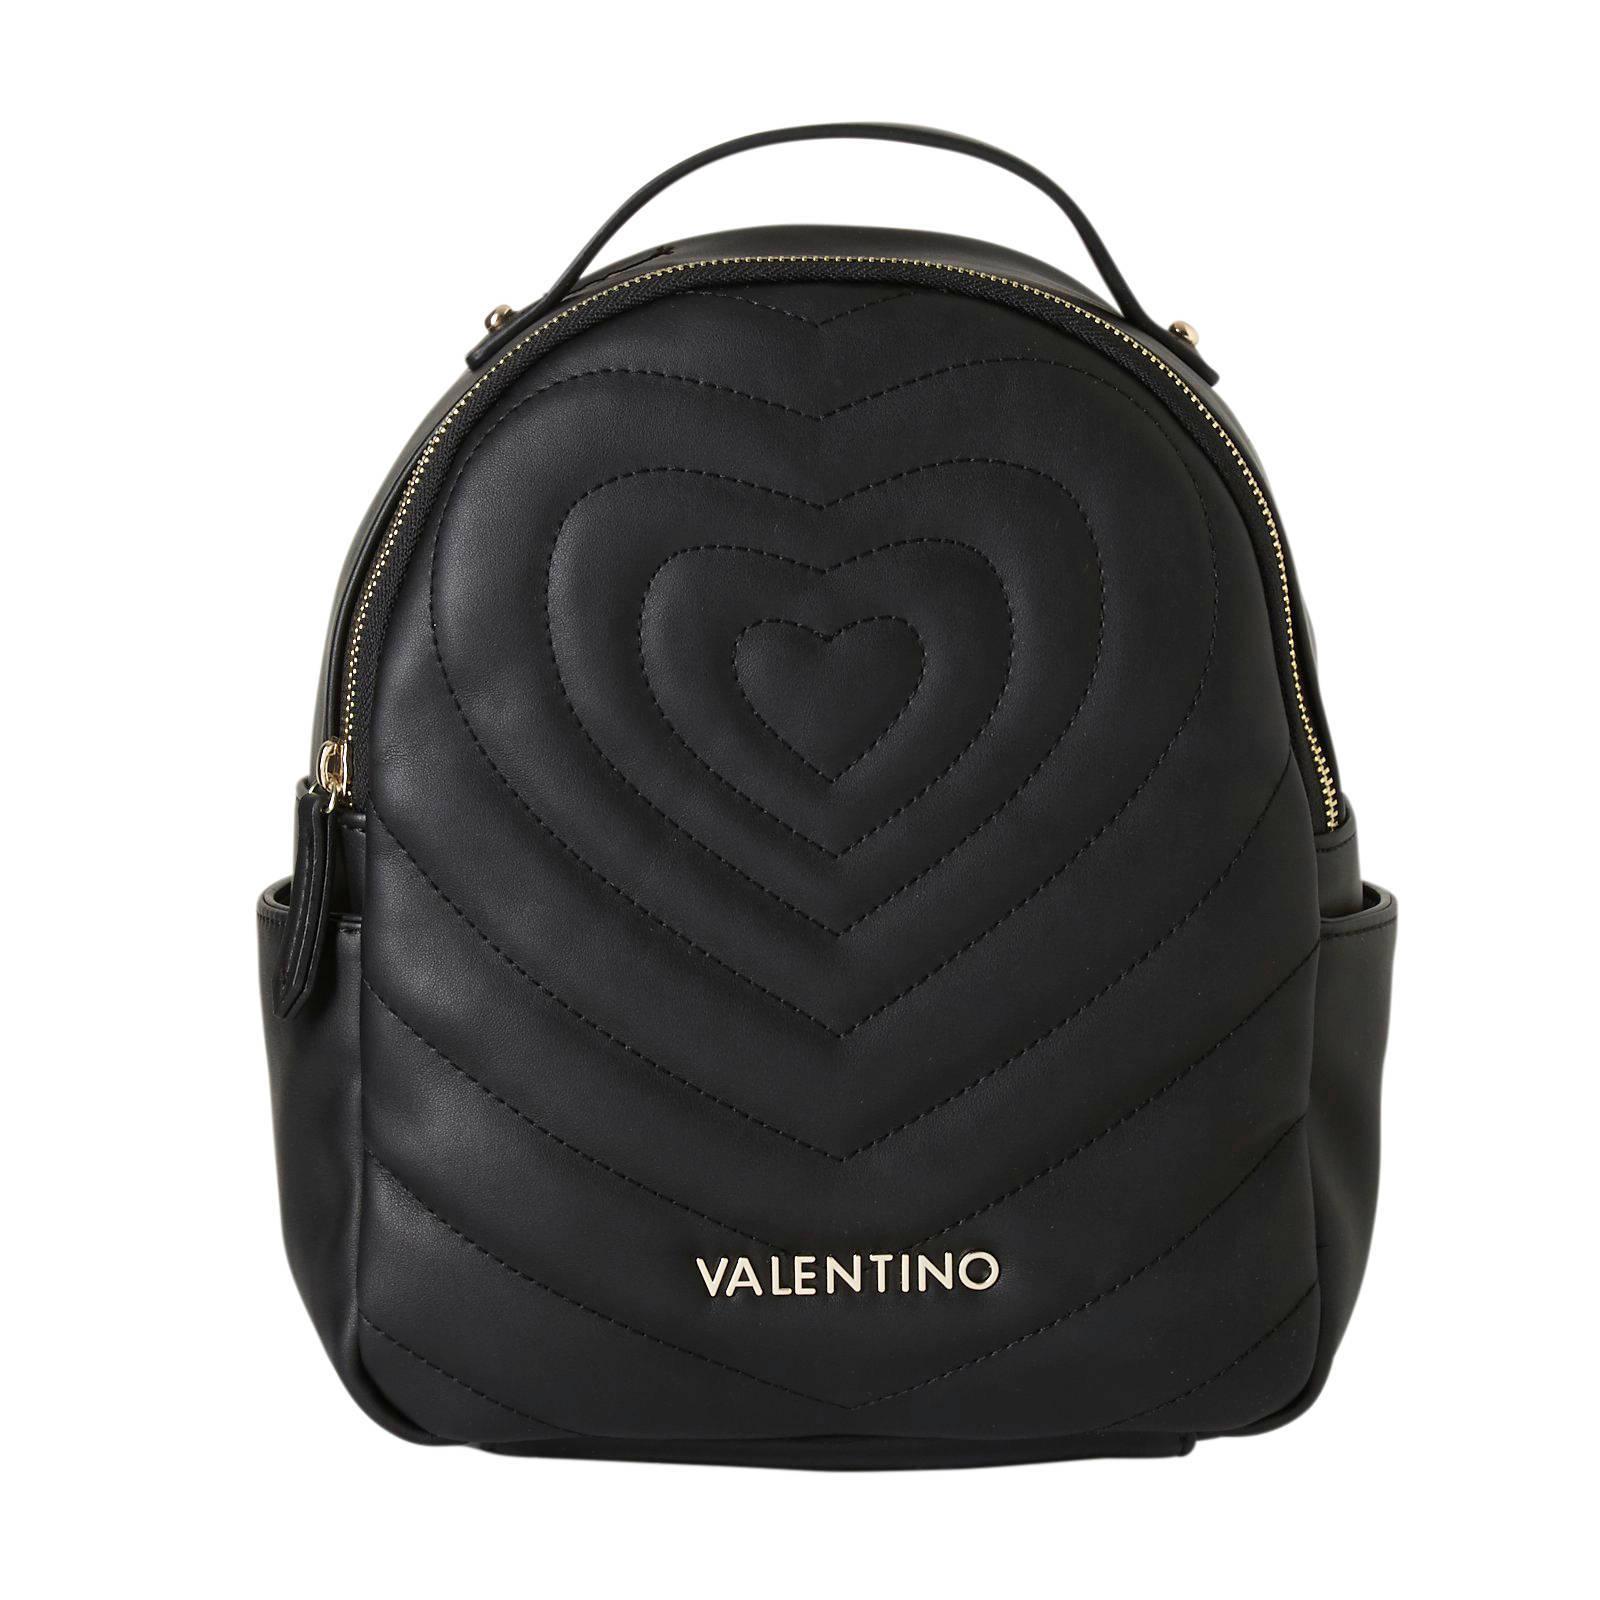 d5acf59667a Valentino rugzak FIONA zwart | wehkamp